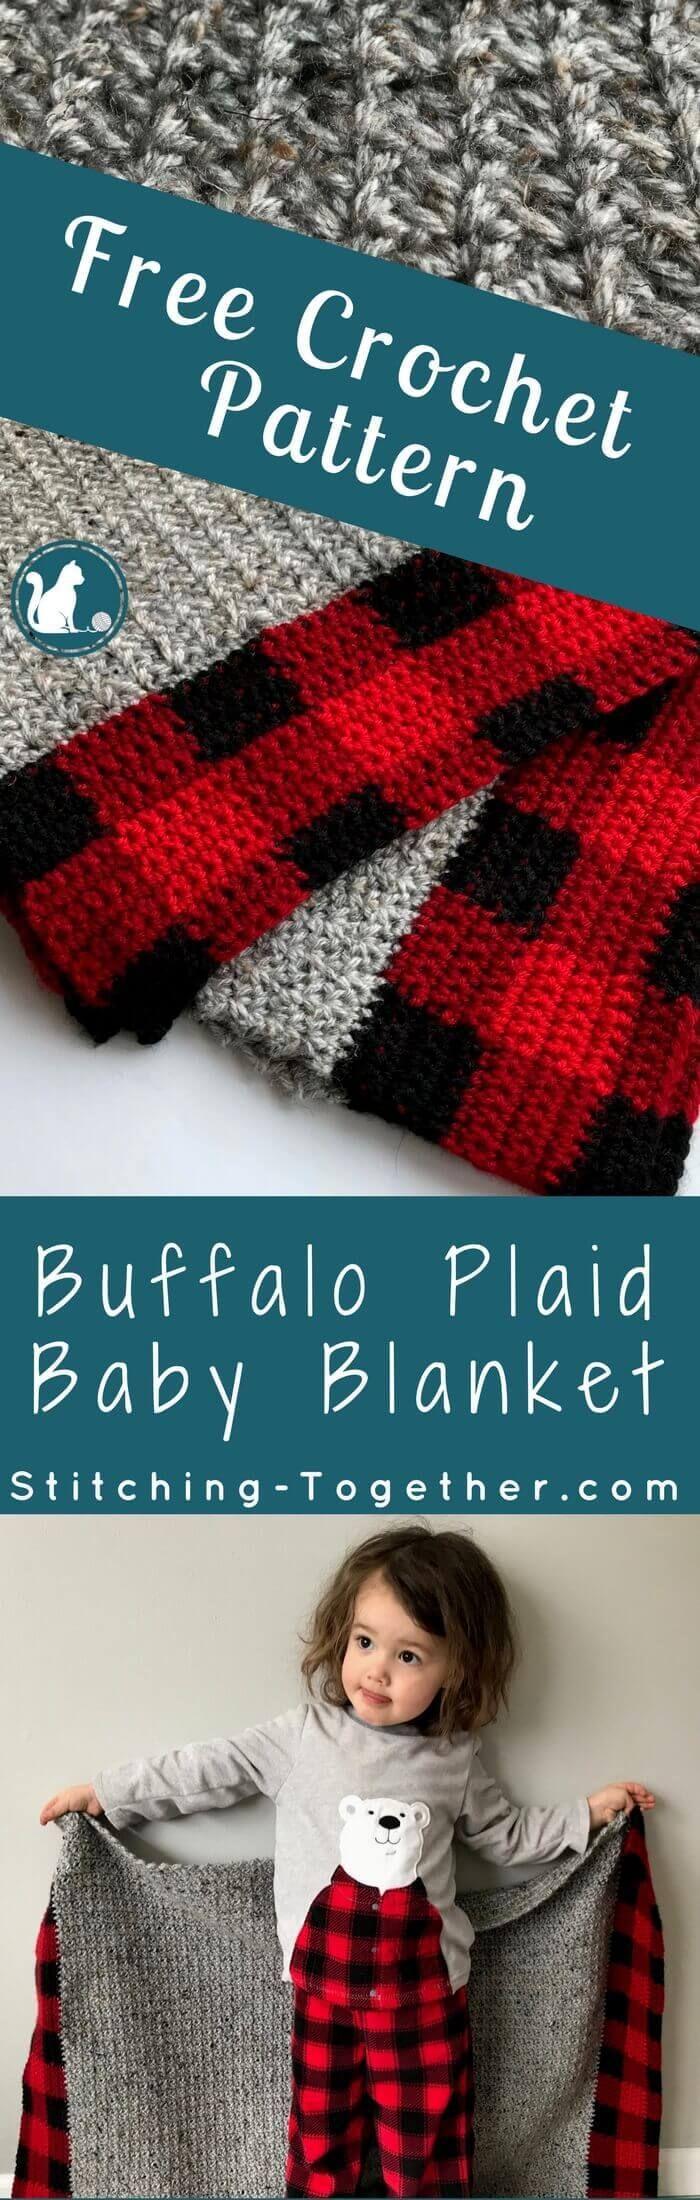 Crochet Black and White Modern Farmhouse Nursery Buffalo Plaid Baby Blanket Ready to Ship Buffalo Check Baby Bedding 30 x 38 inches